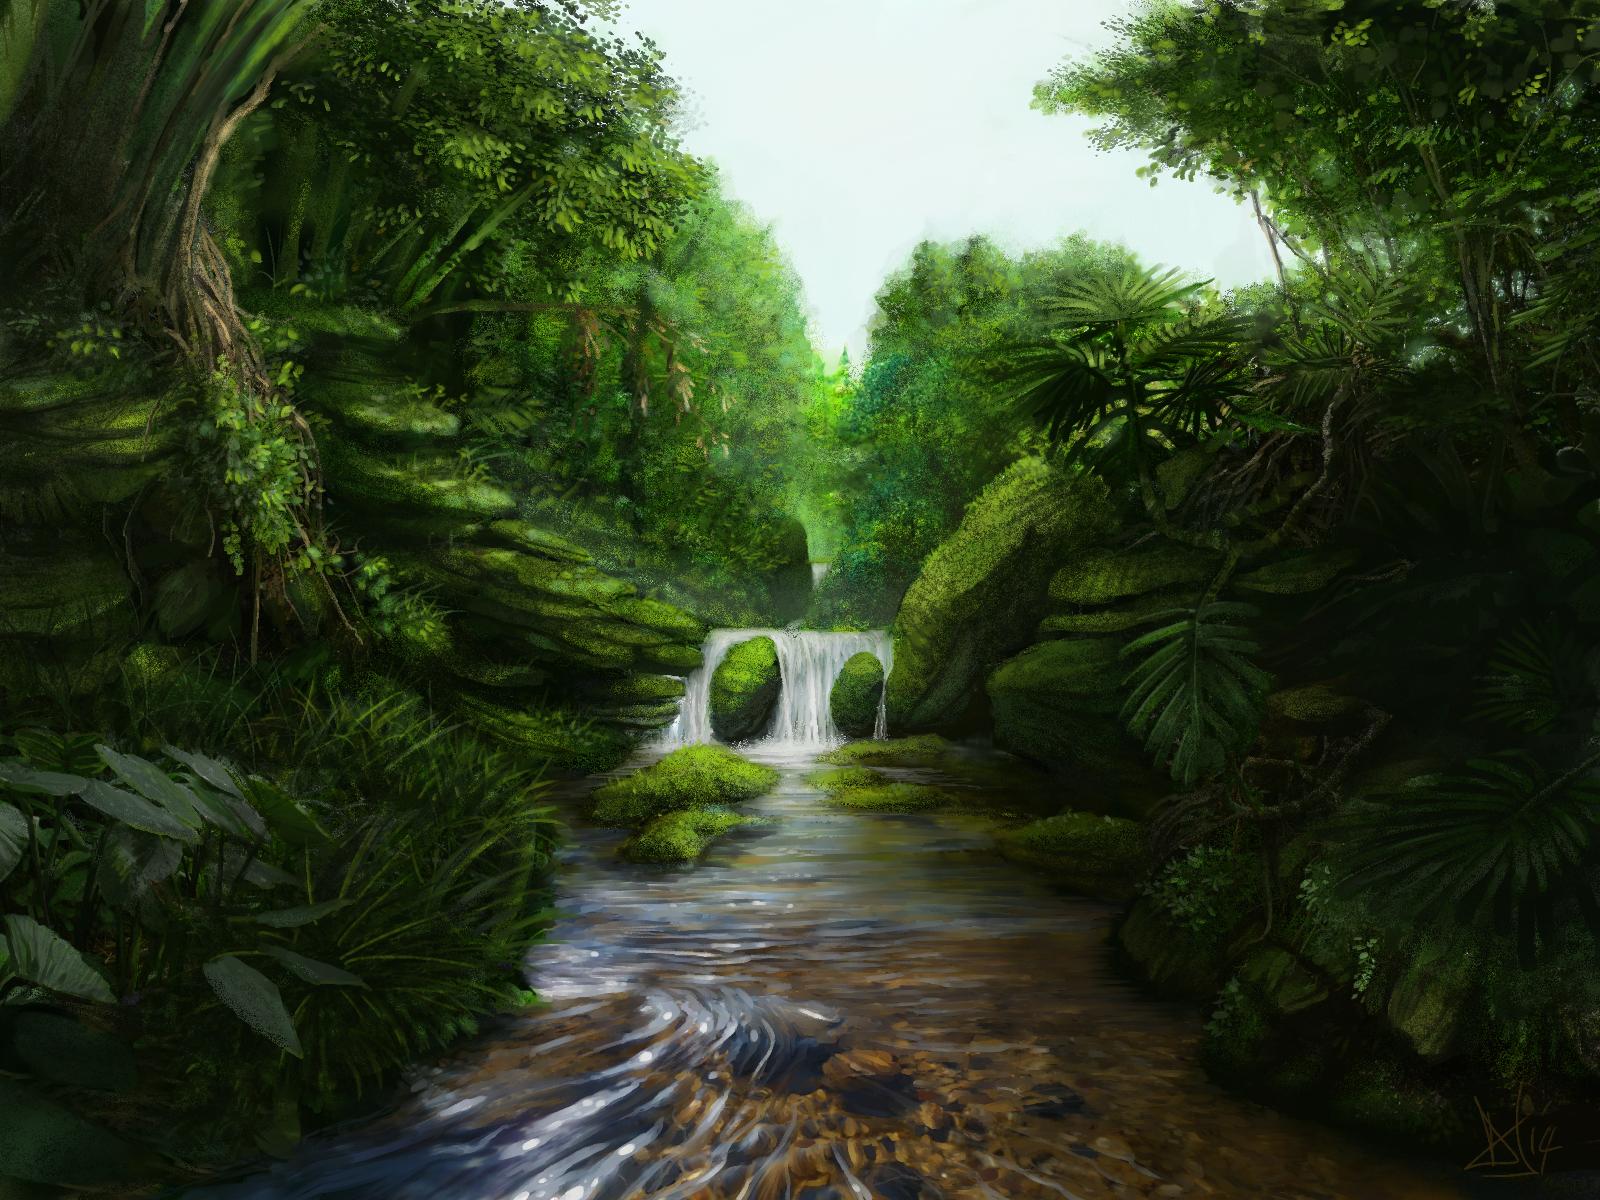 jungle_waterfall_2_of_3_by_sketchbookuniverse-d76cgxz